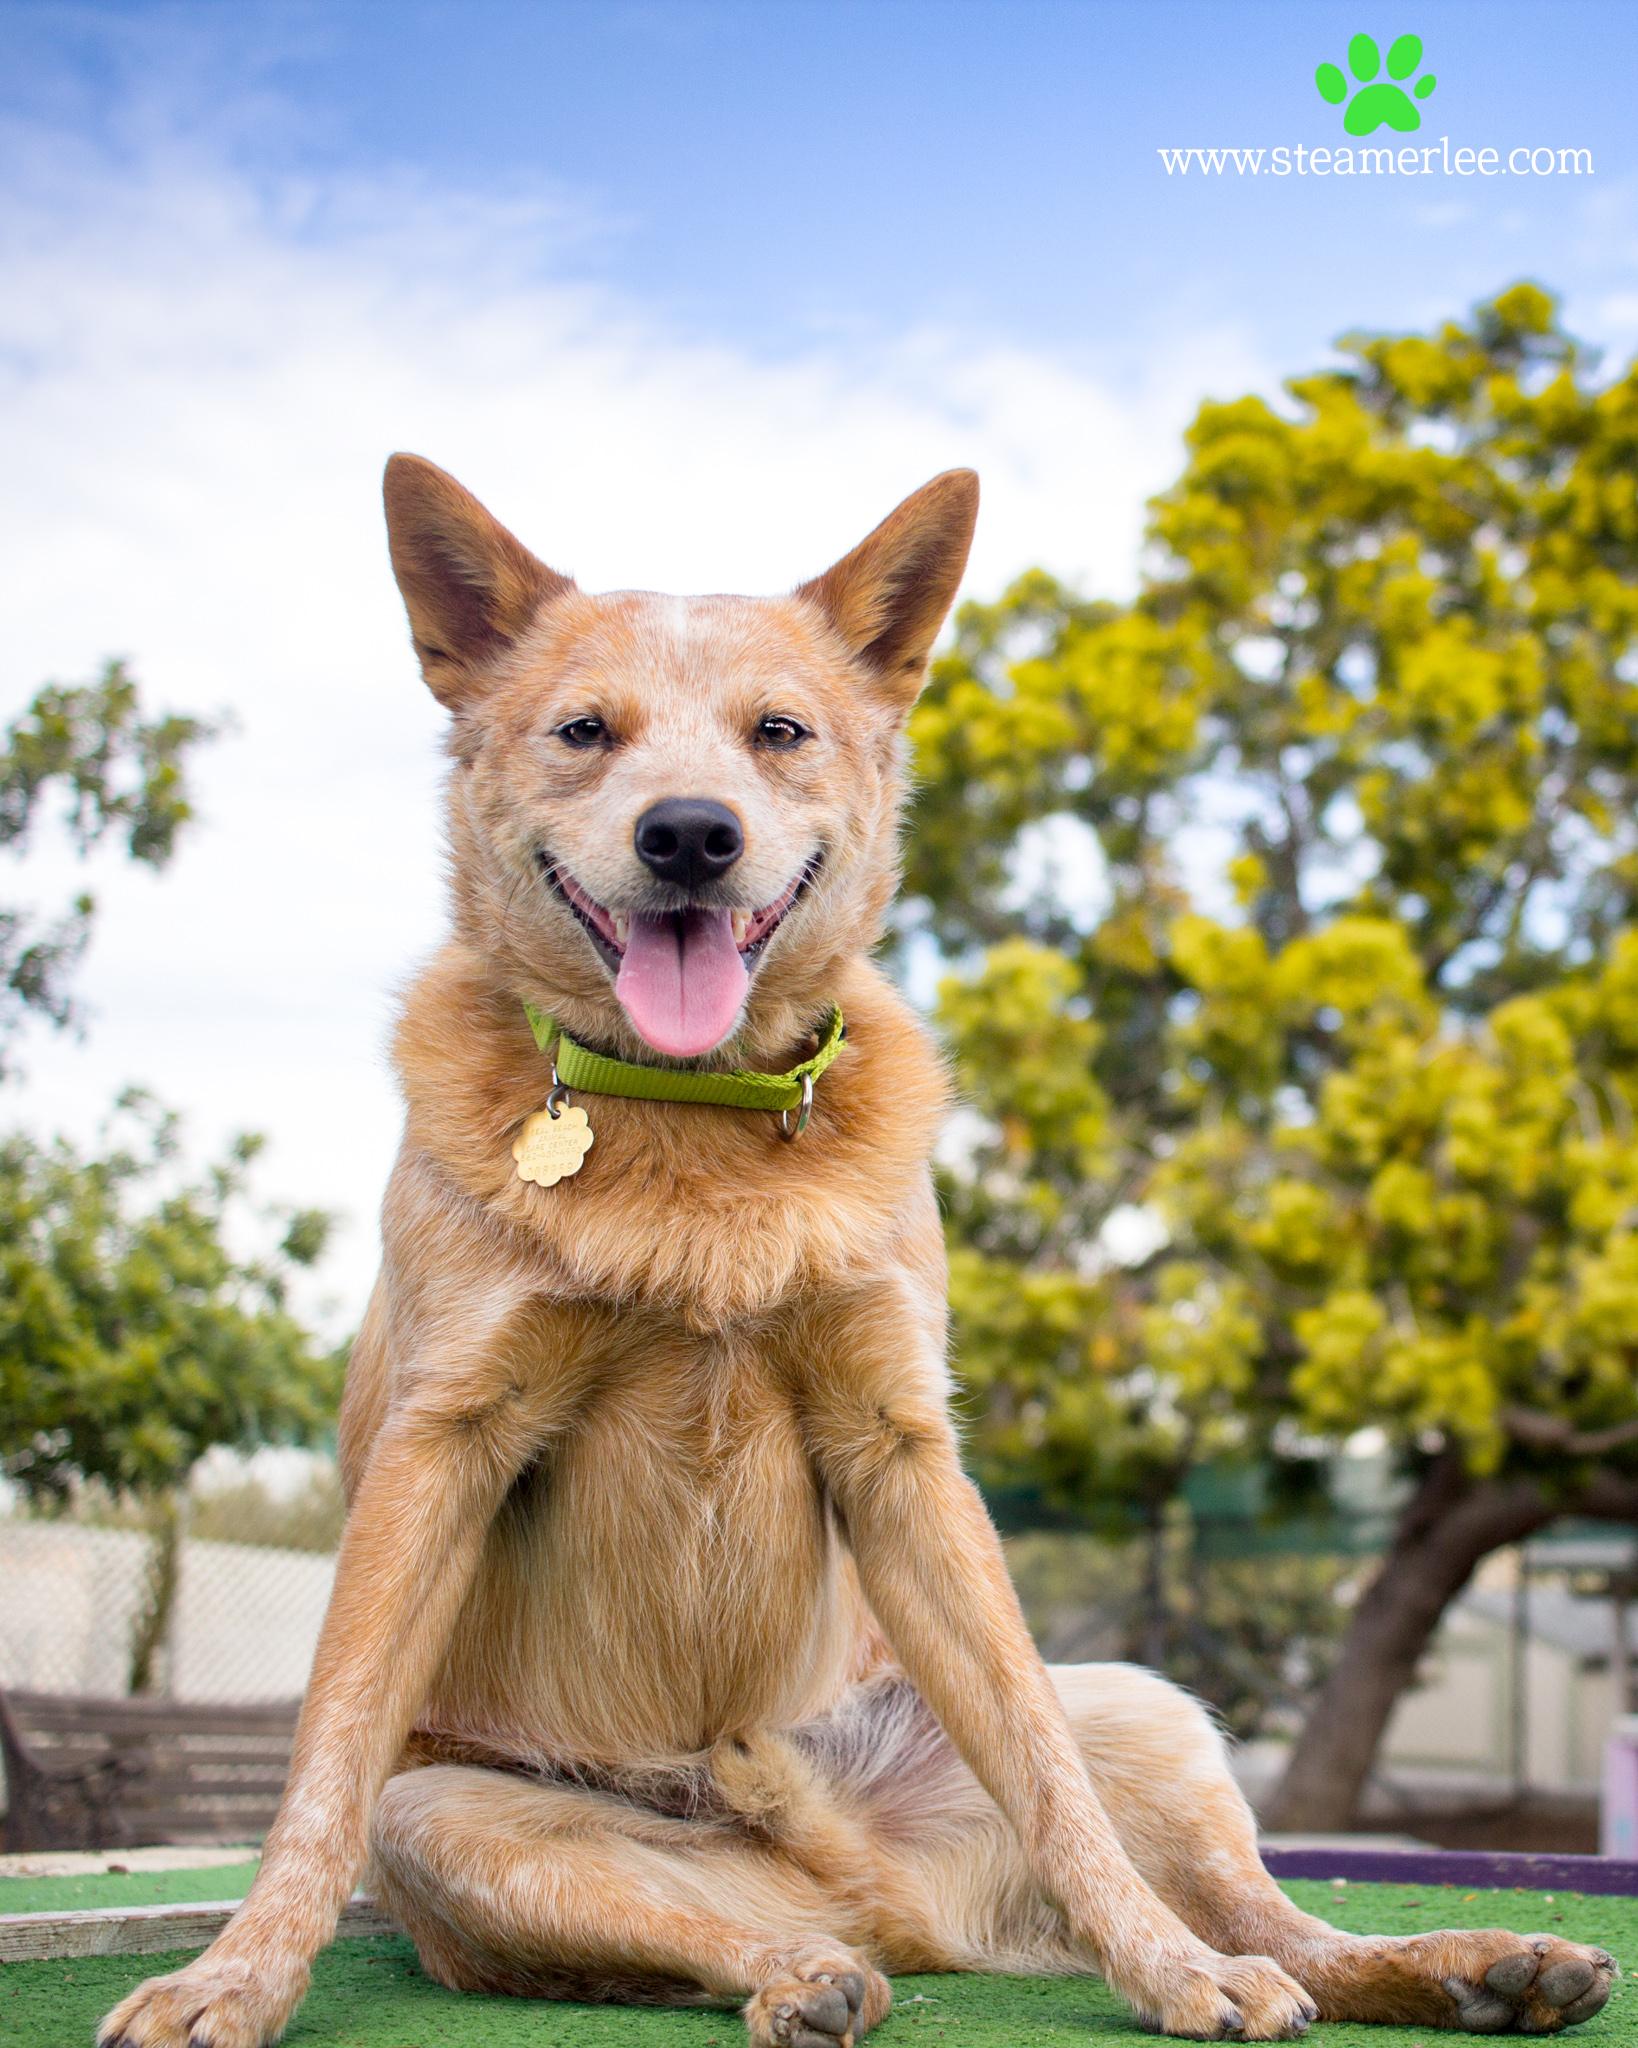 233-Orange-County-Dog-Photography-Steamer-Lee-Southern-California-SBACC.JPG